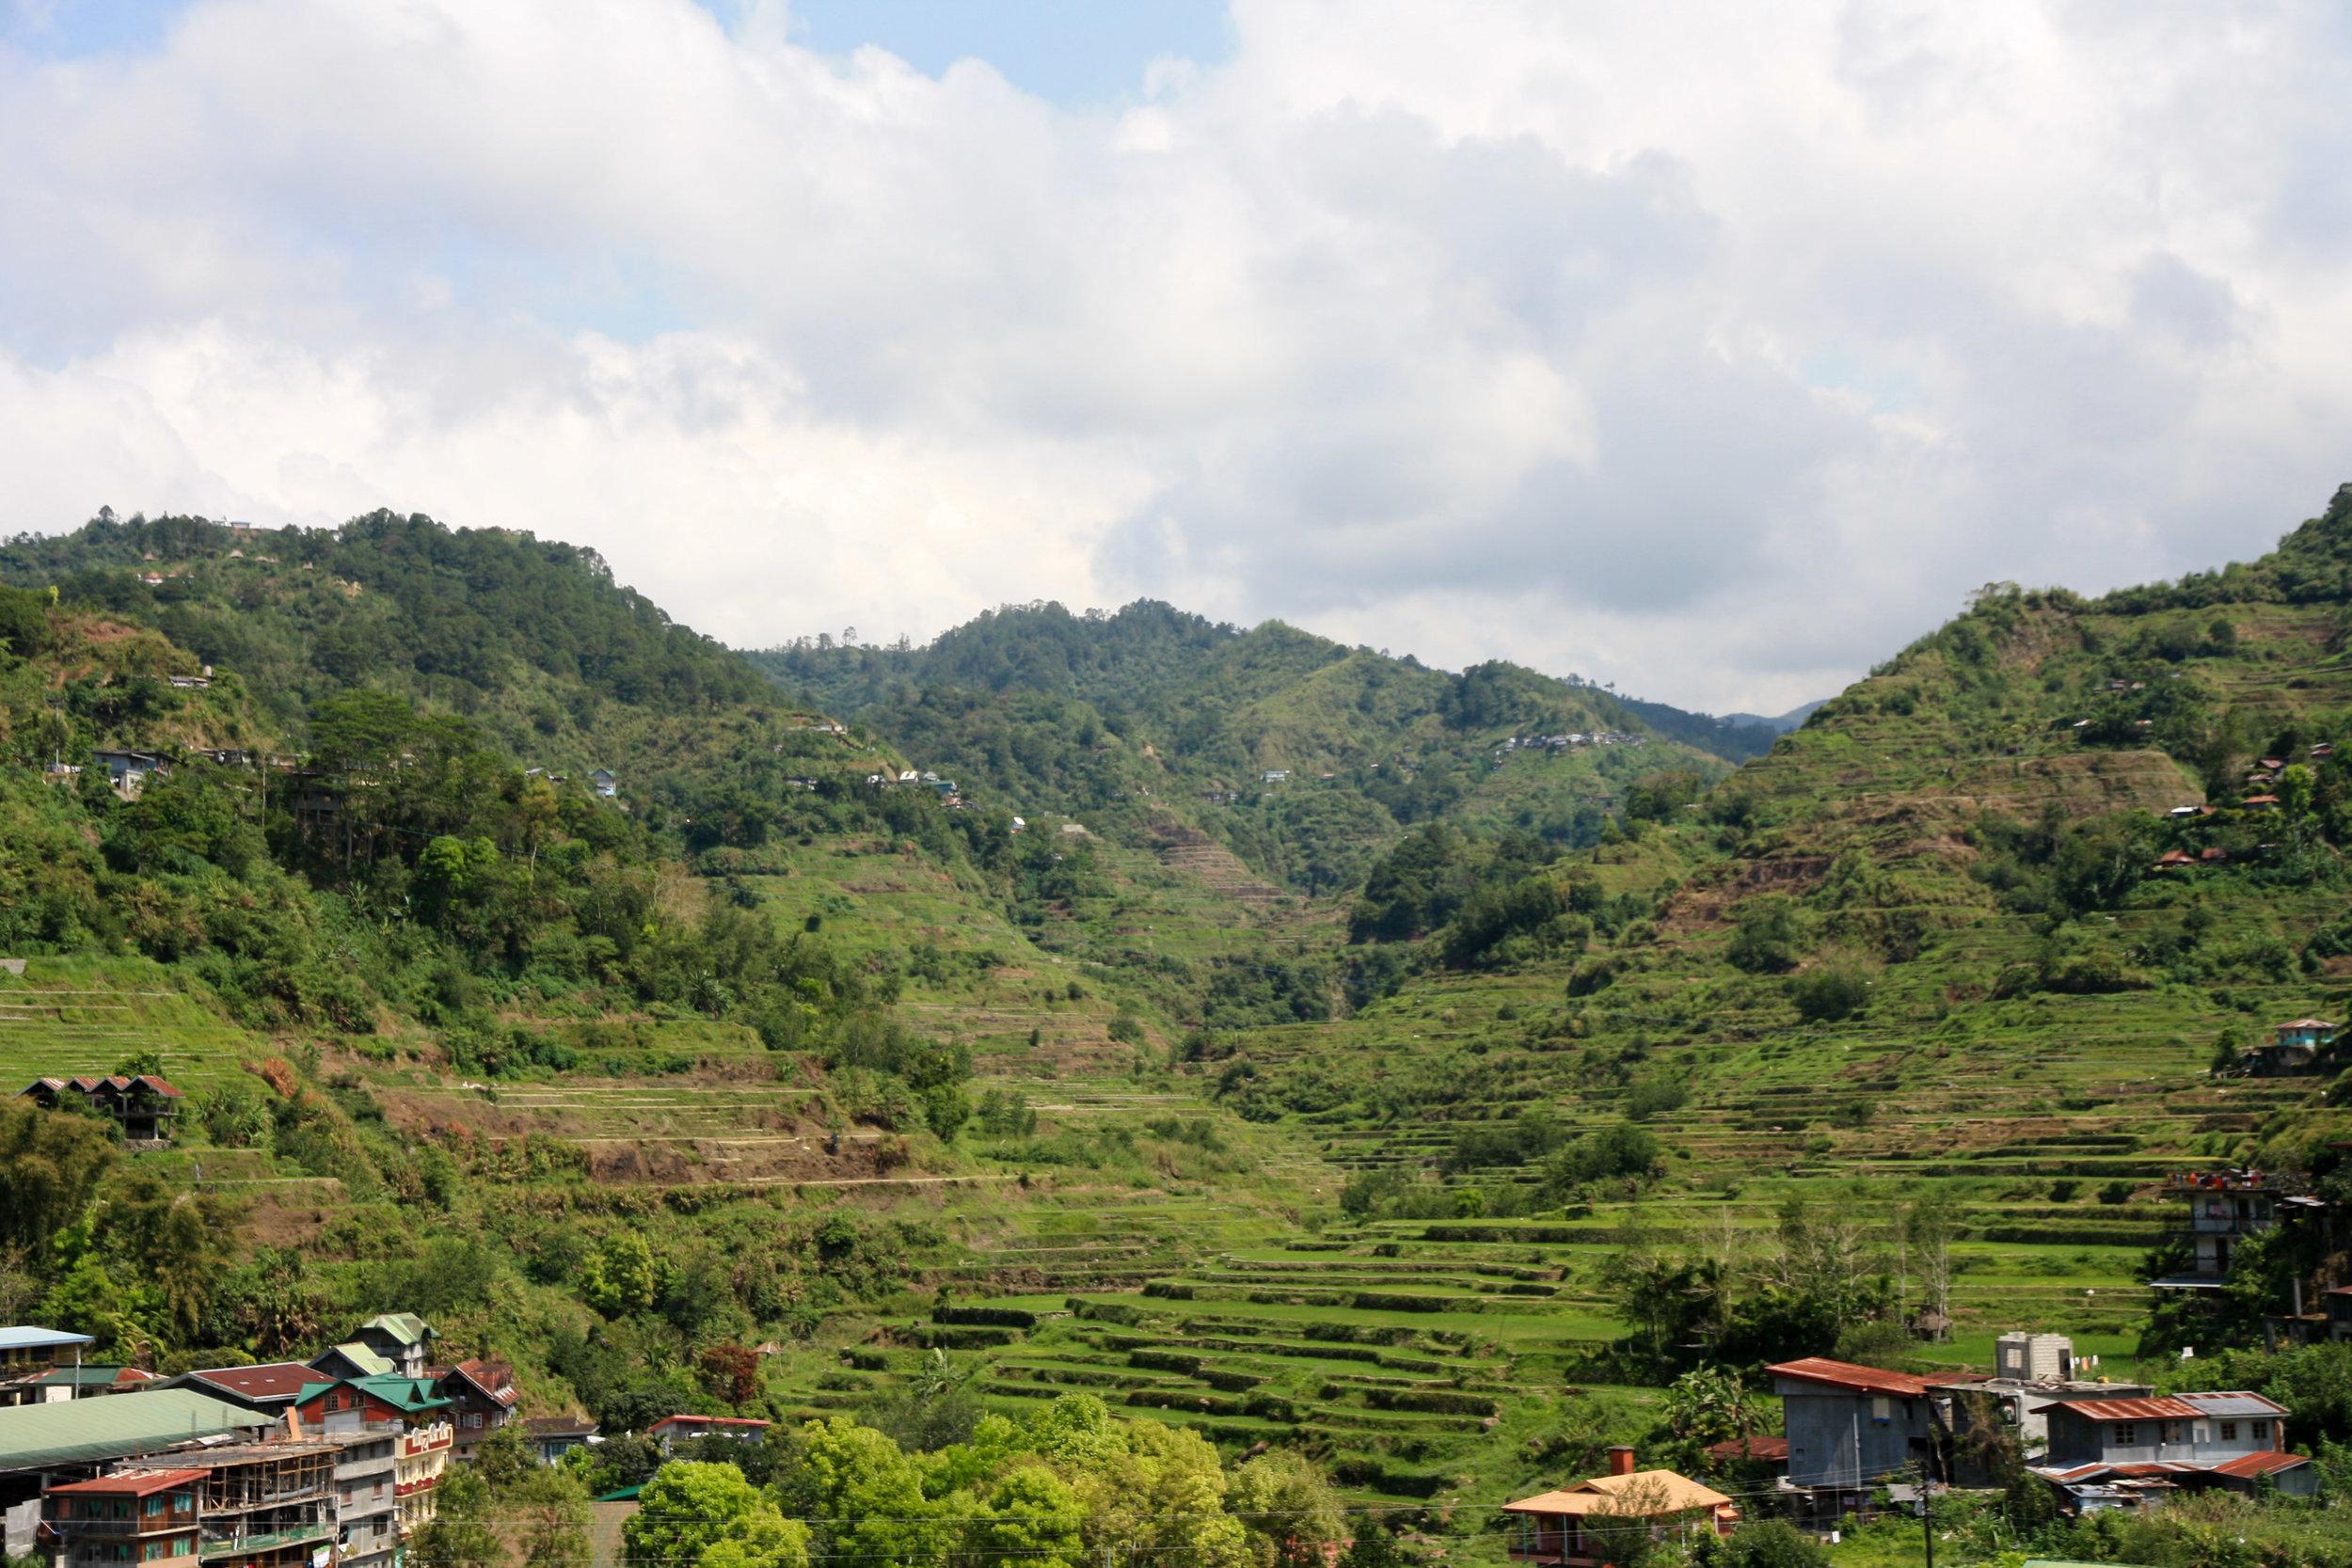 The rice terraces of Banaue